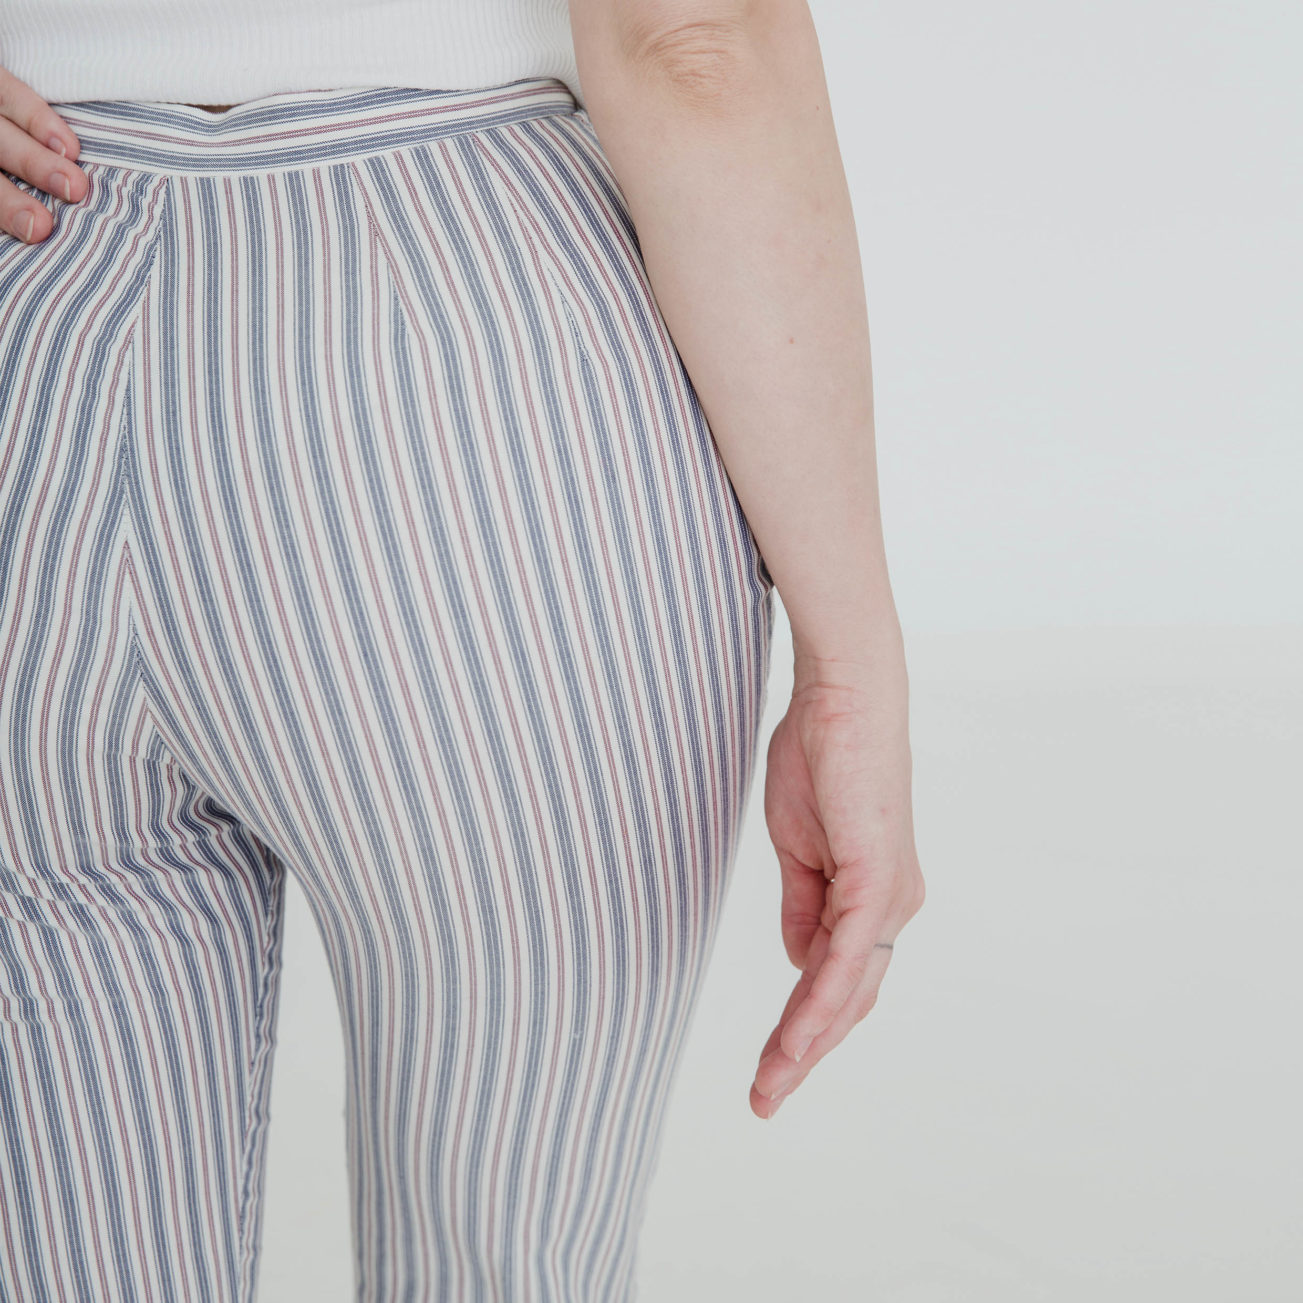 Mod Moddet 60s pants